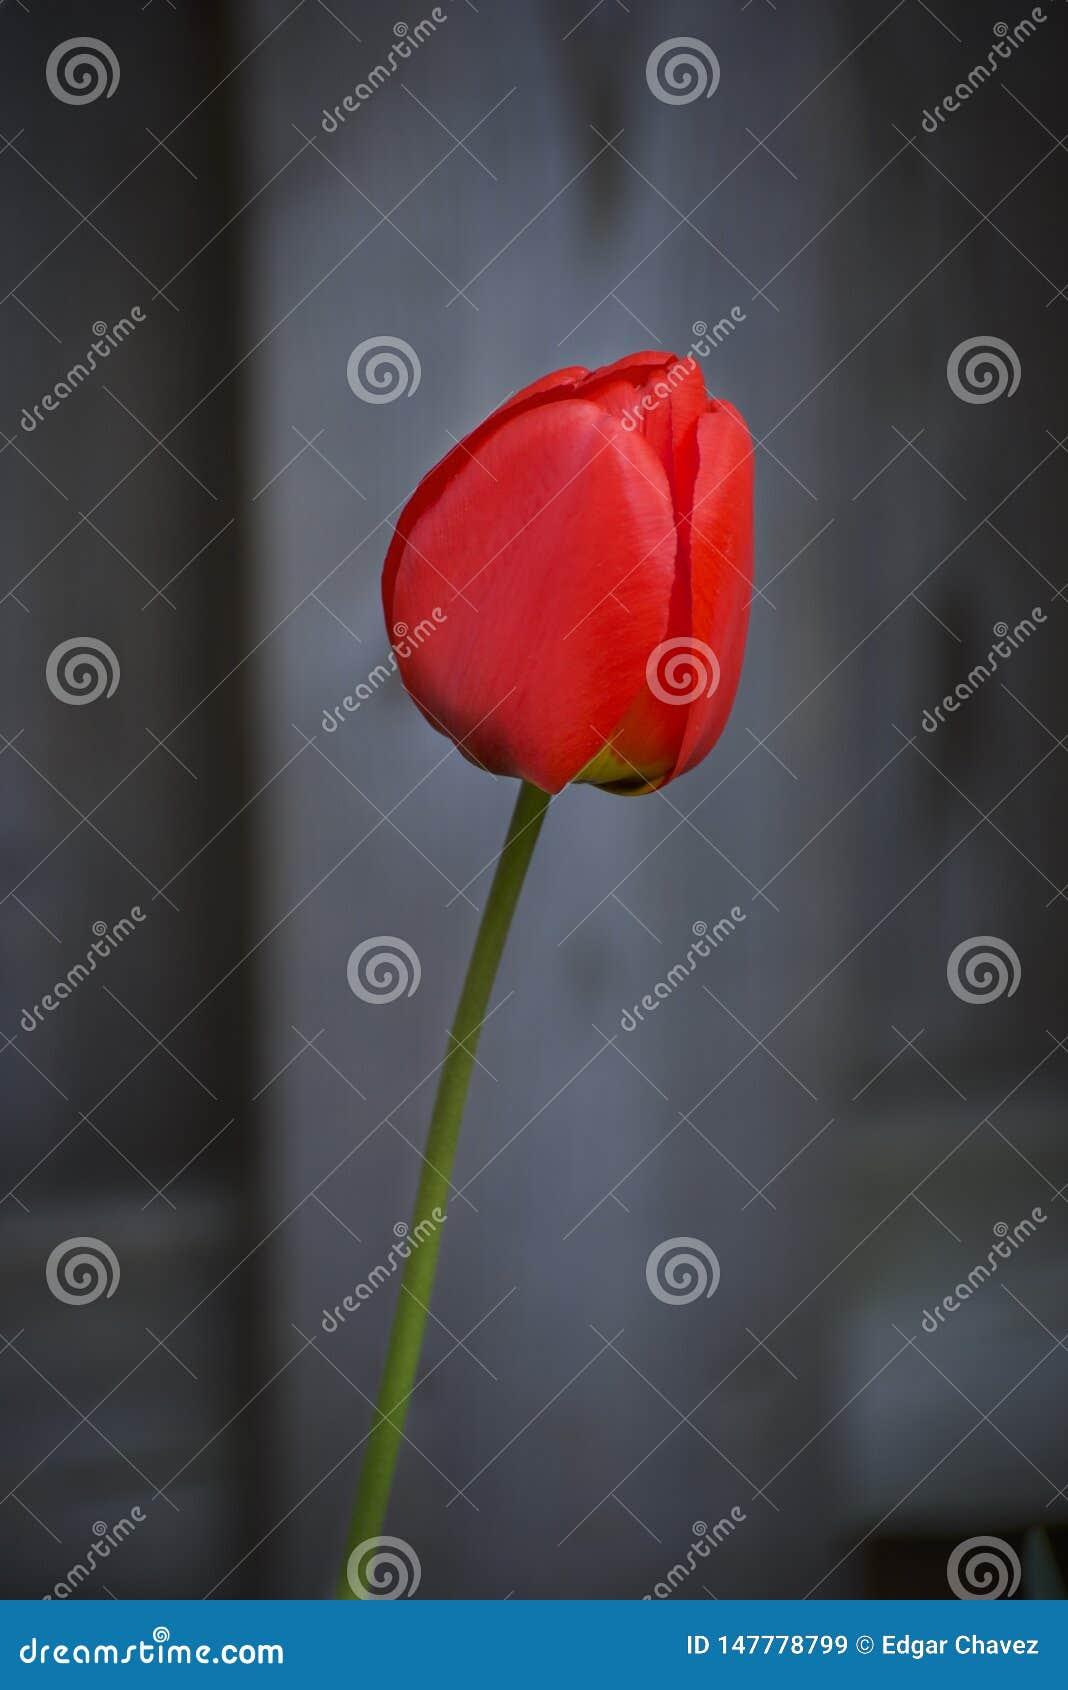 Closeup of a red tulip